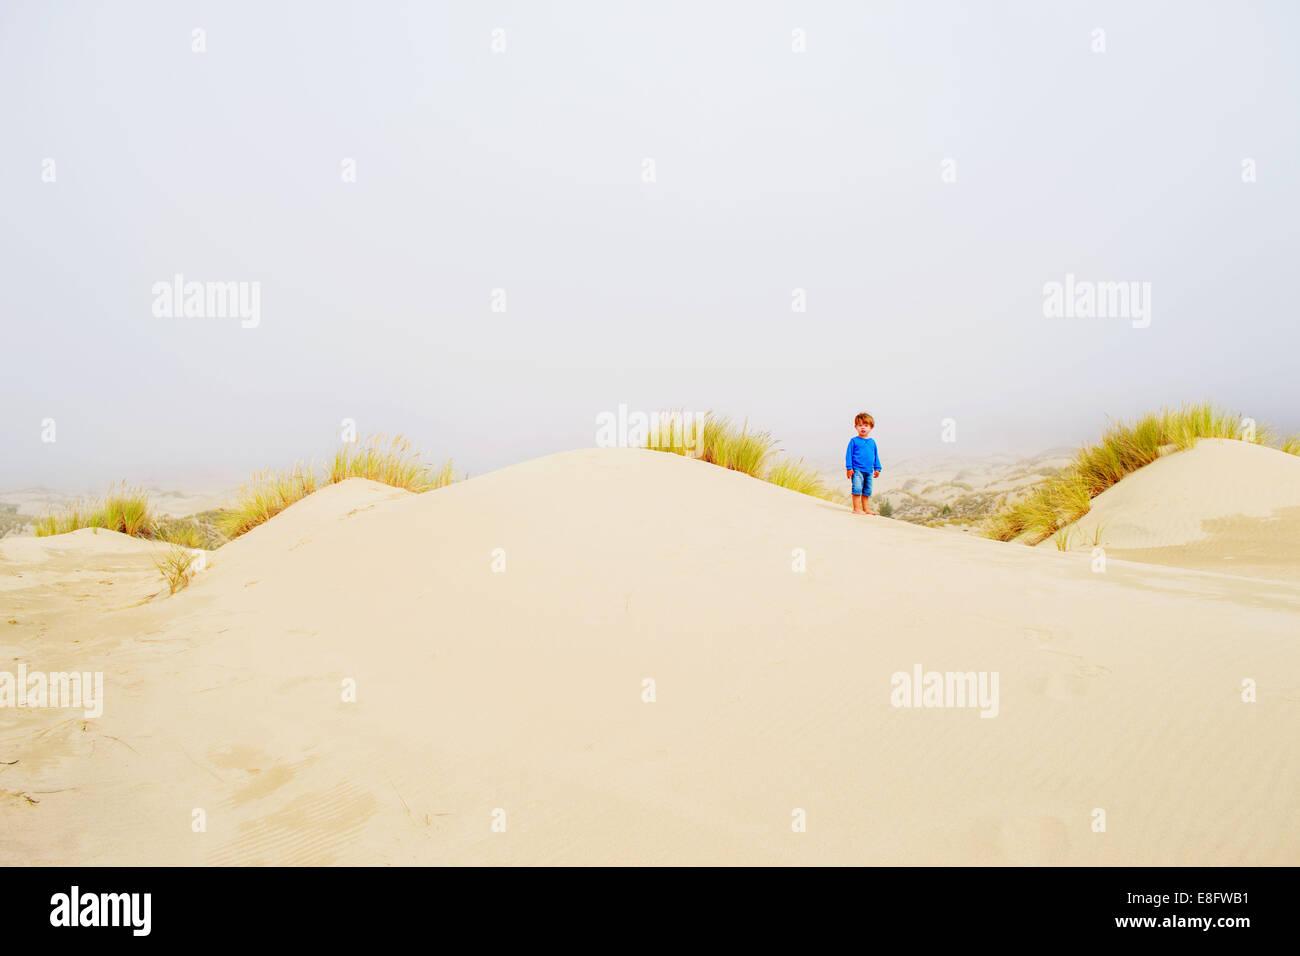 Boy ( 2-3 ) standing on sand dune - Stock Image